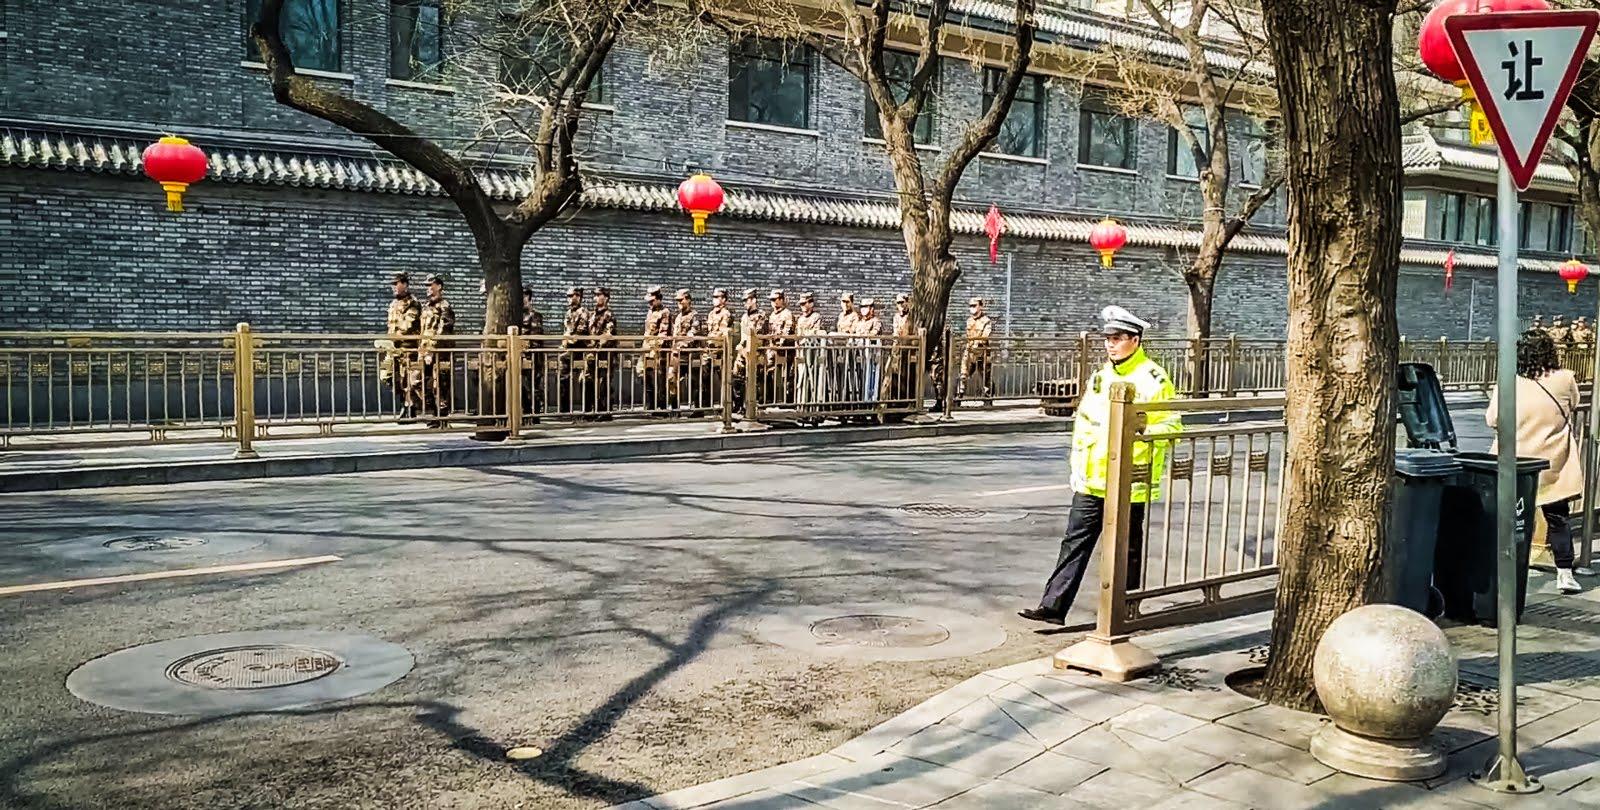 vojáci v ulicích Pekingu